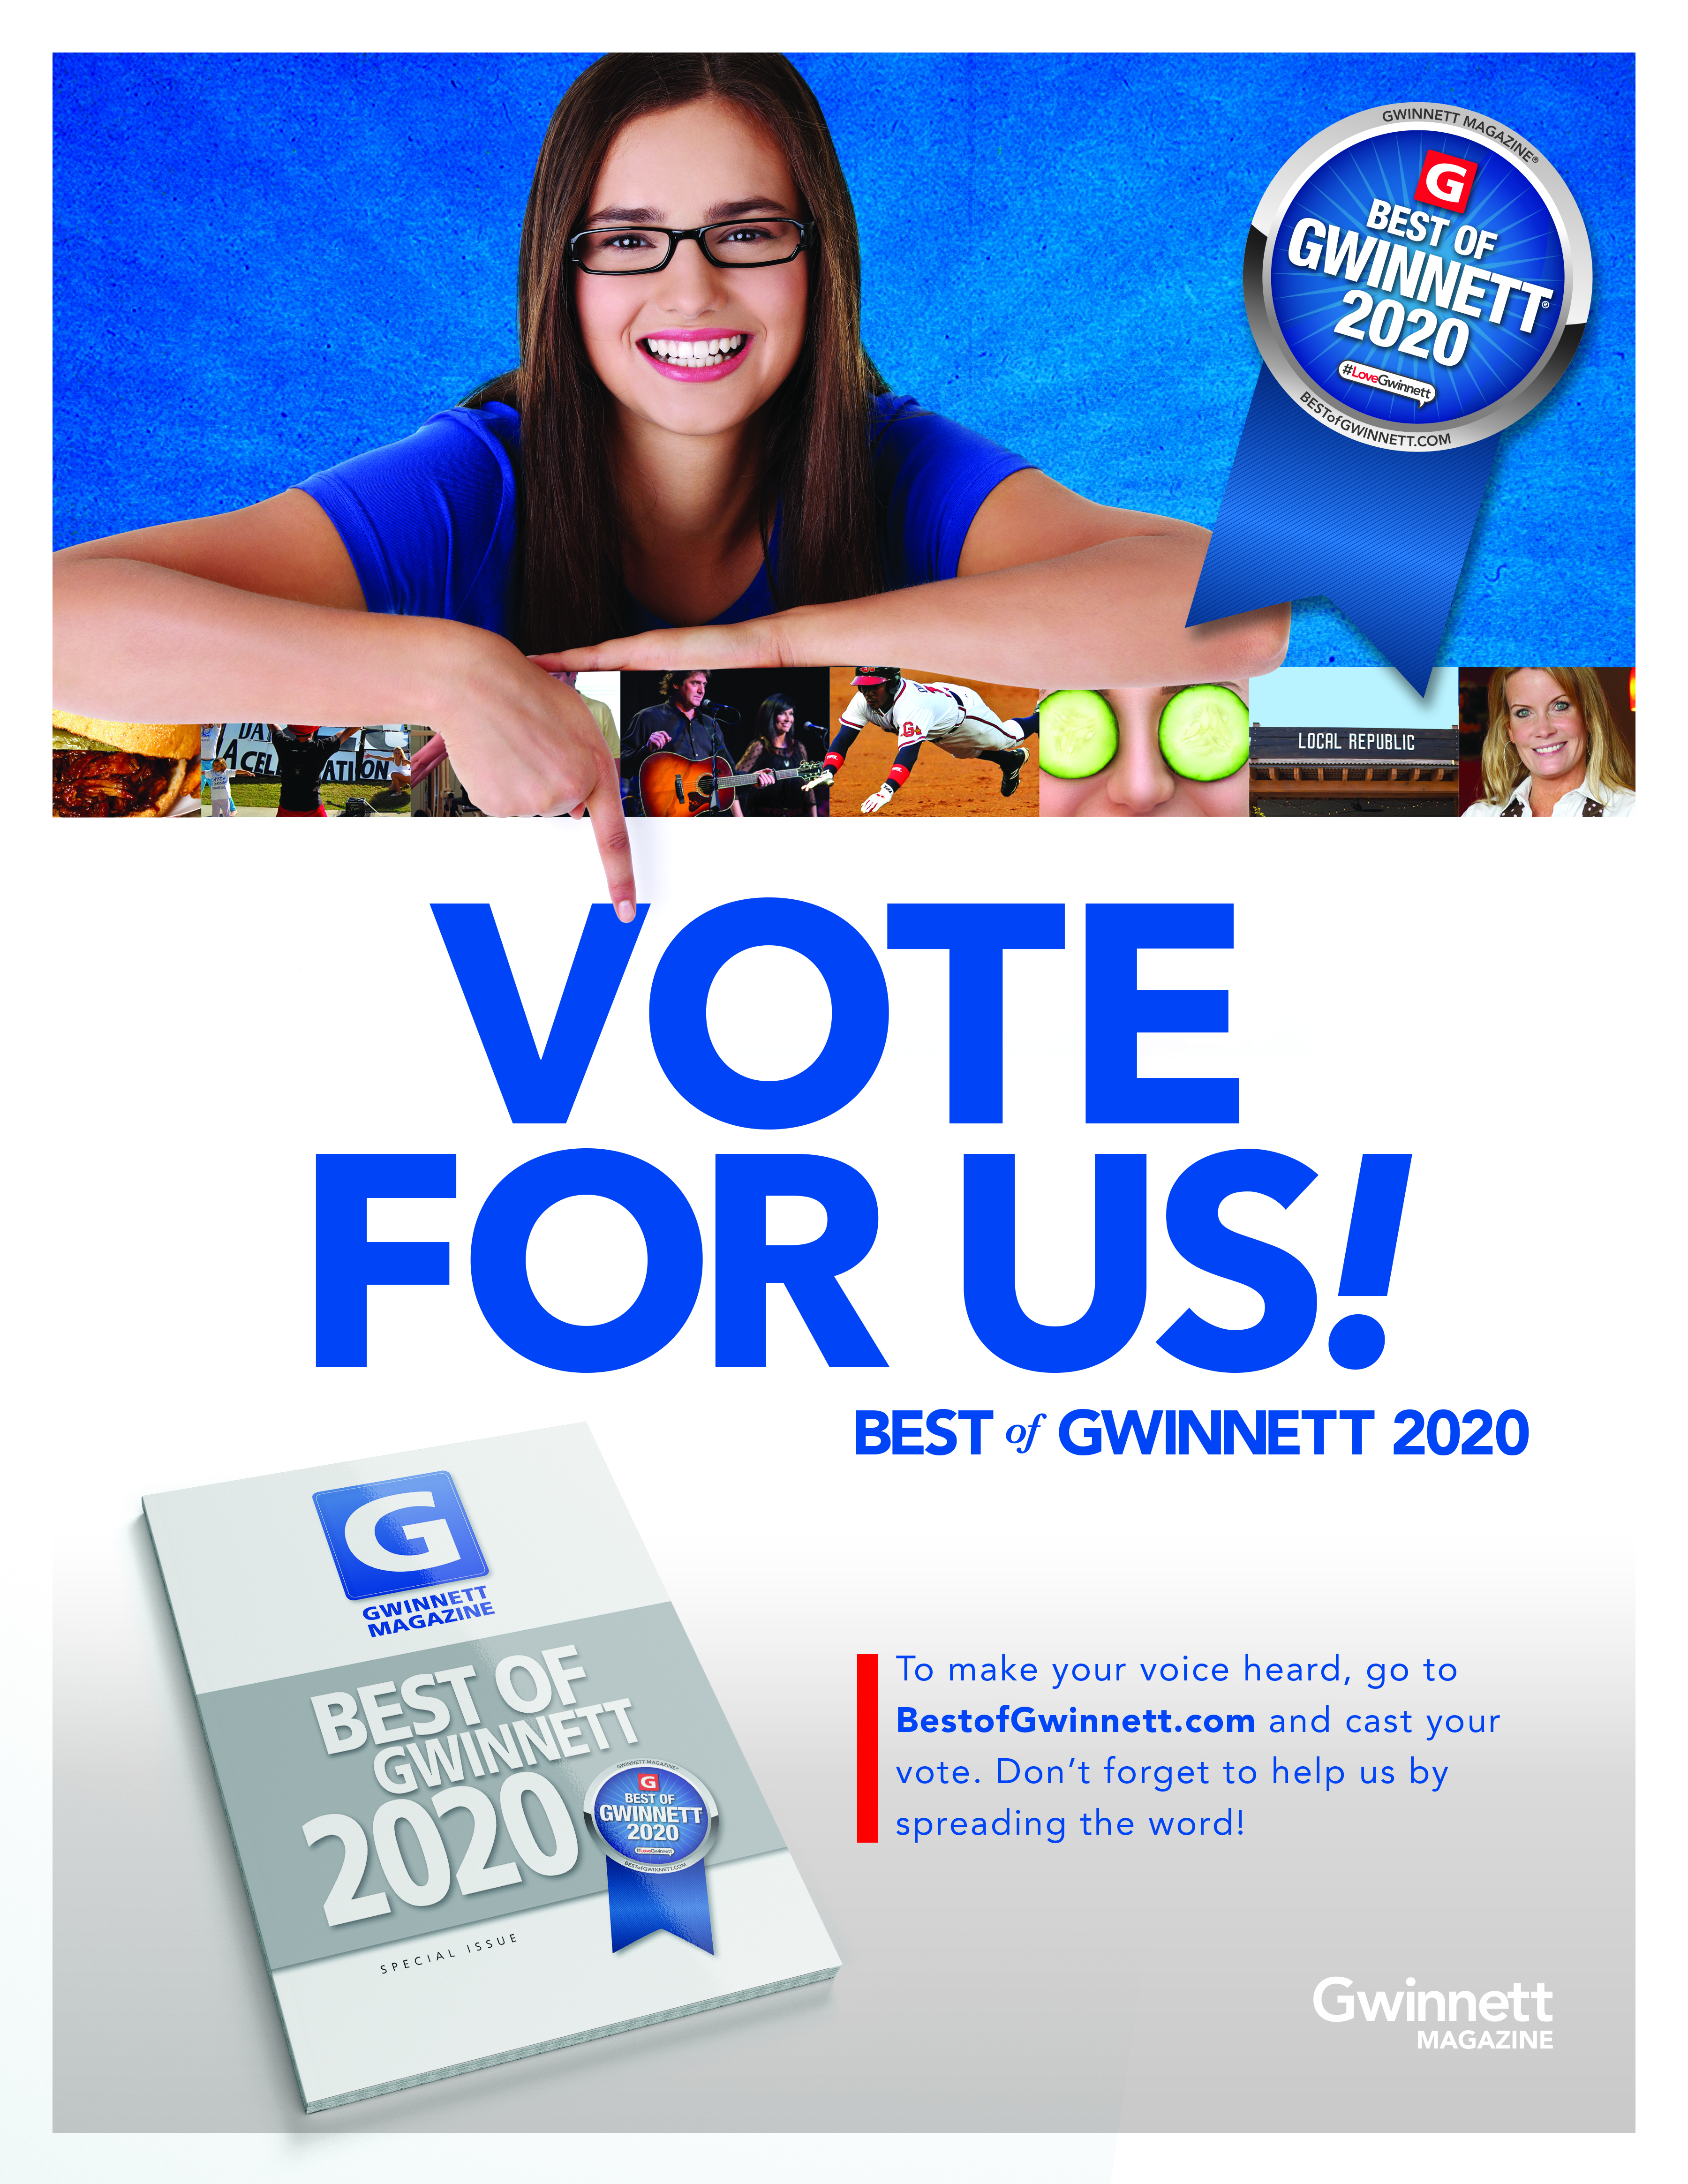 2020 Best of Gwinnett Campaign Kit Table Top